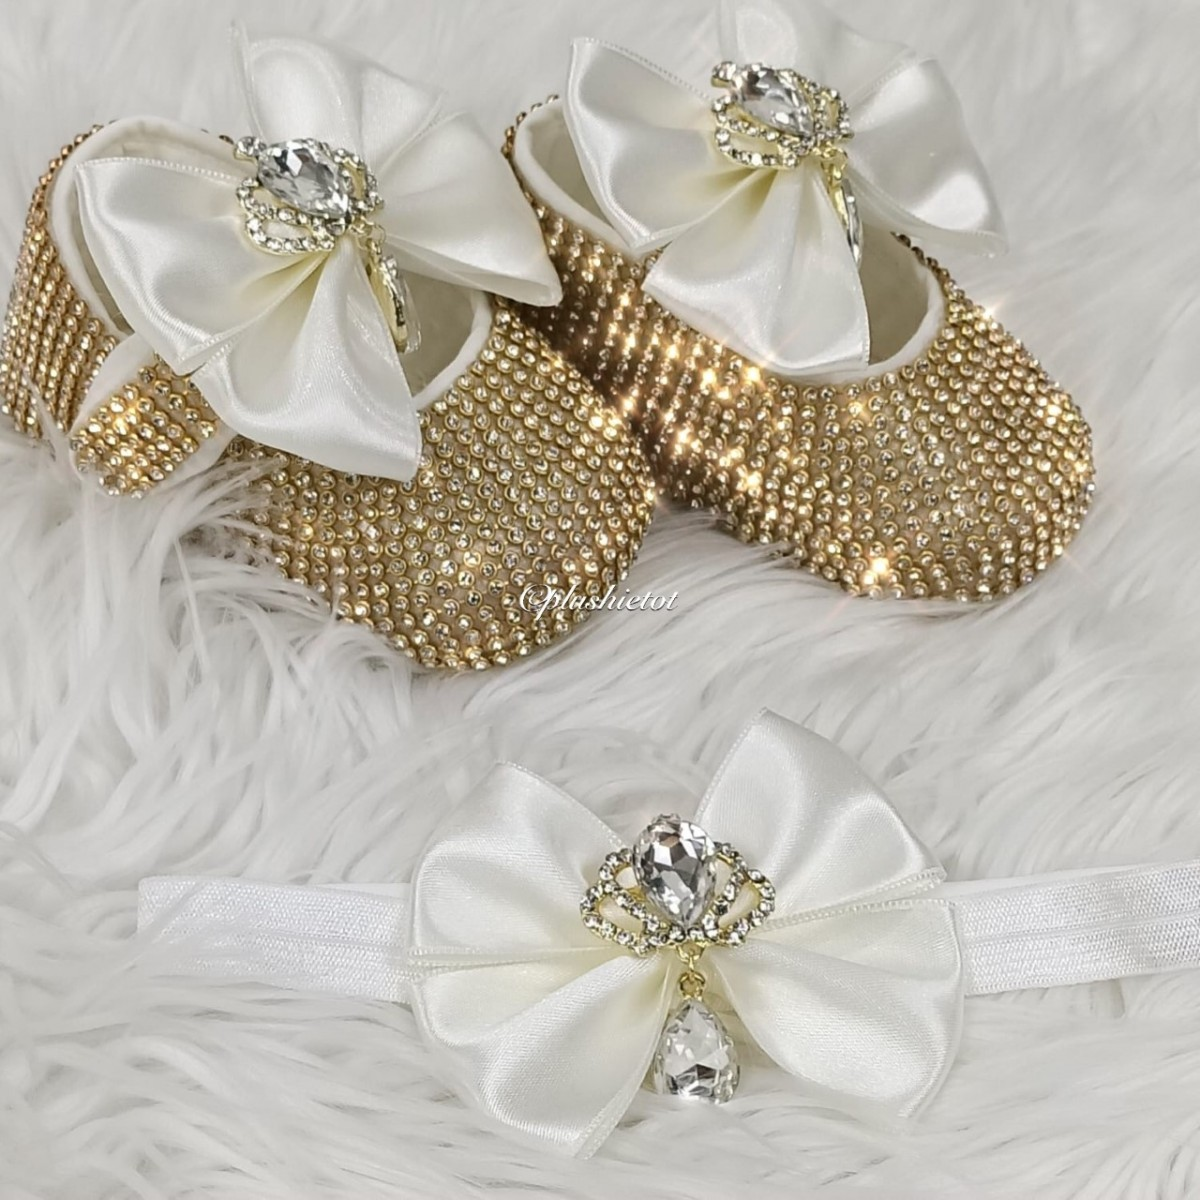 Cinderella Shoes & Headband - Off White & Gold